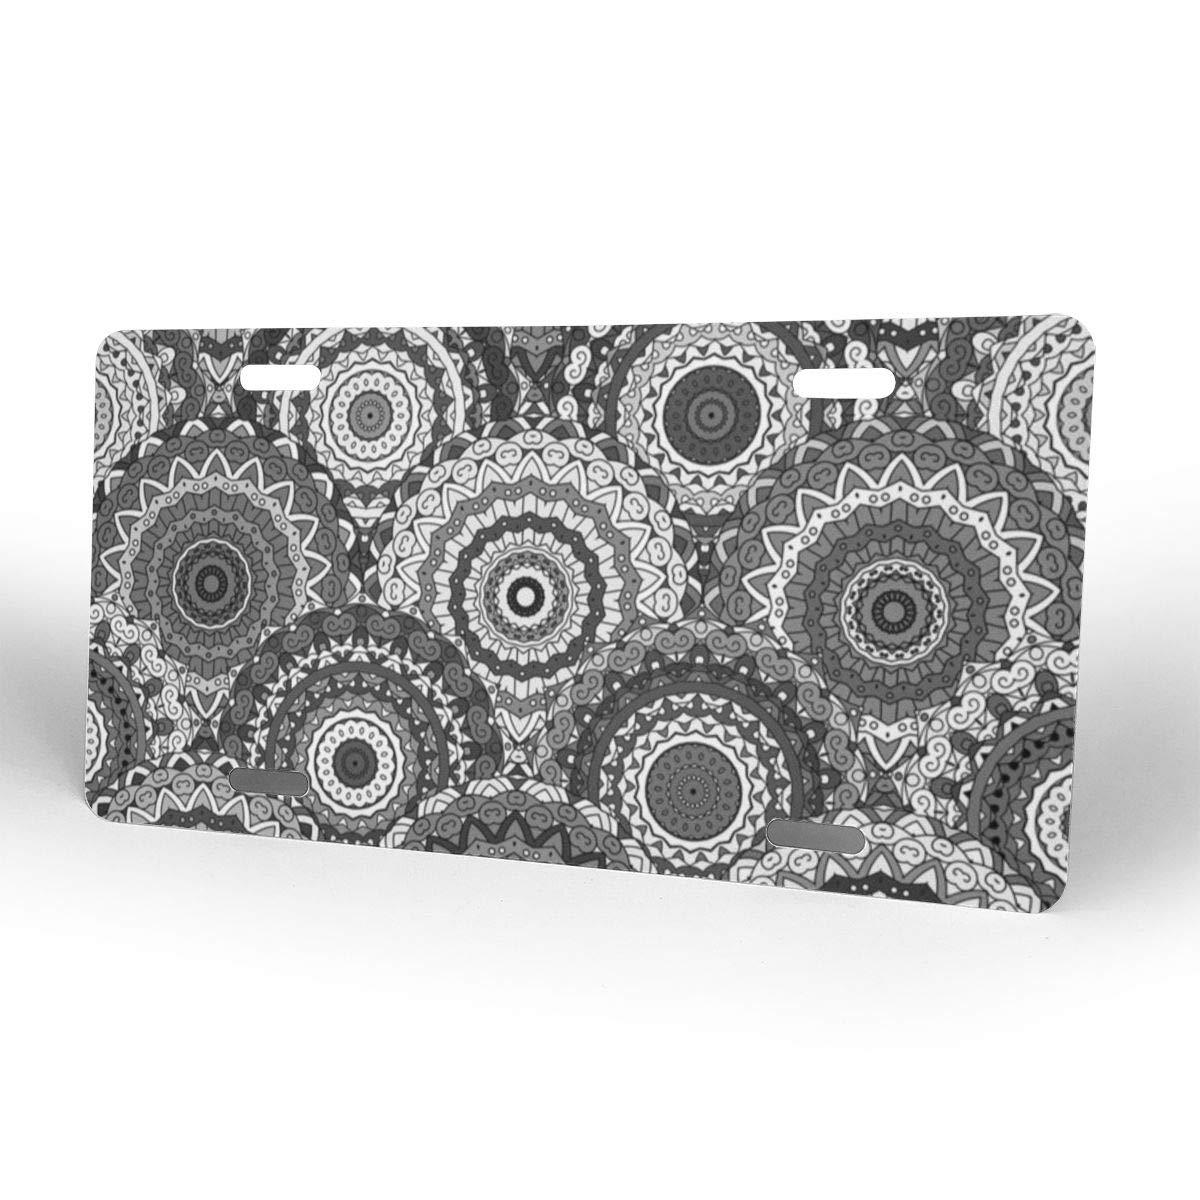 67f58ceac396 Amazon.com: AXGOGO Oriental Style Fabric Personalized Custom Name ...